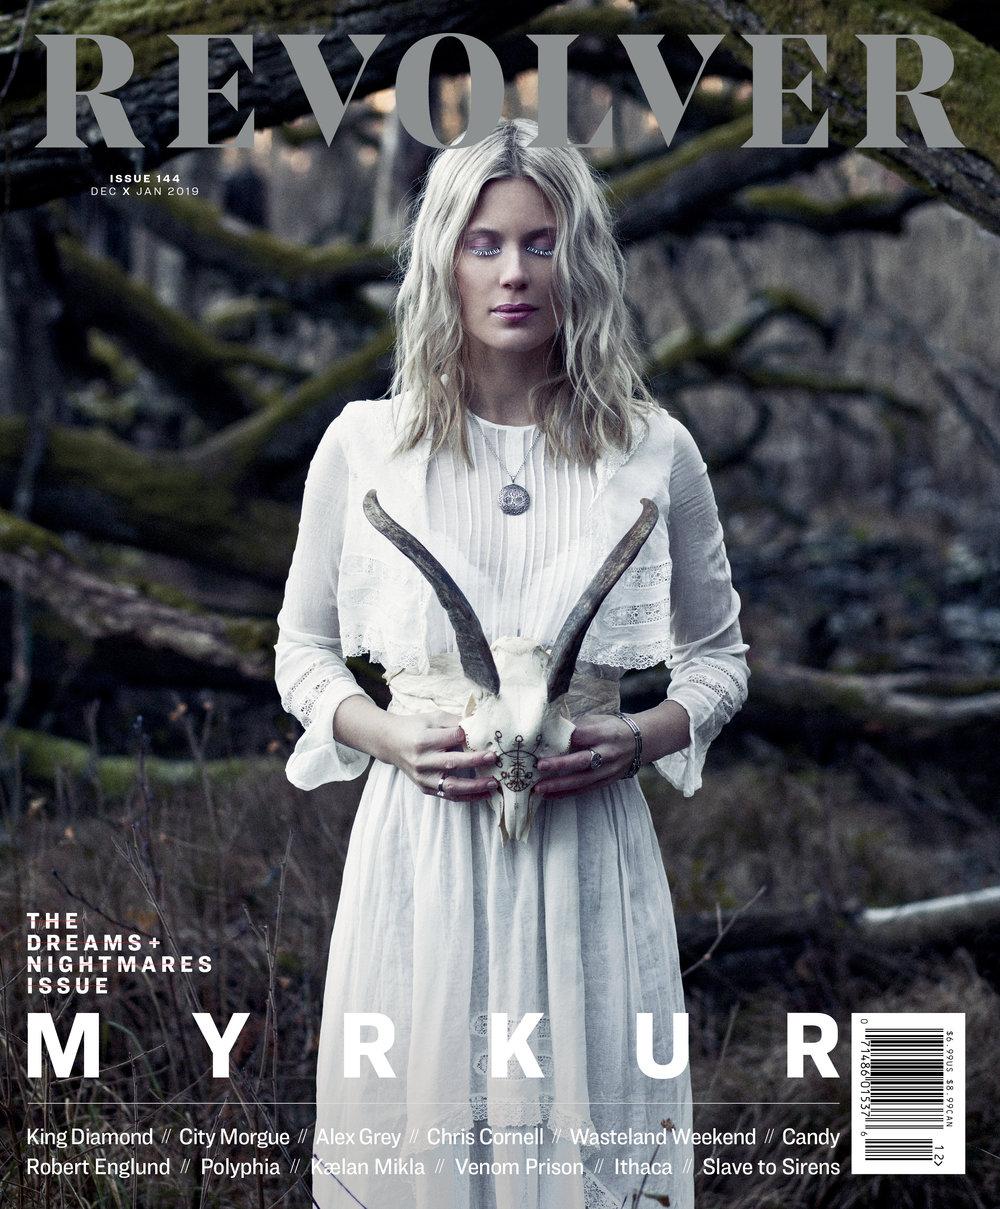 REV_0119_COVER_MYRKUR.jpg